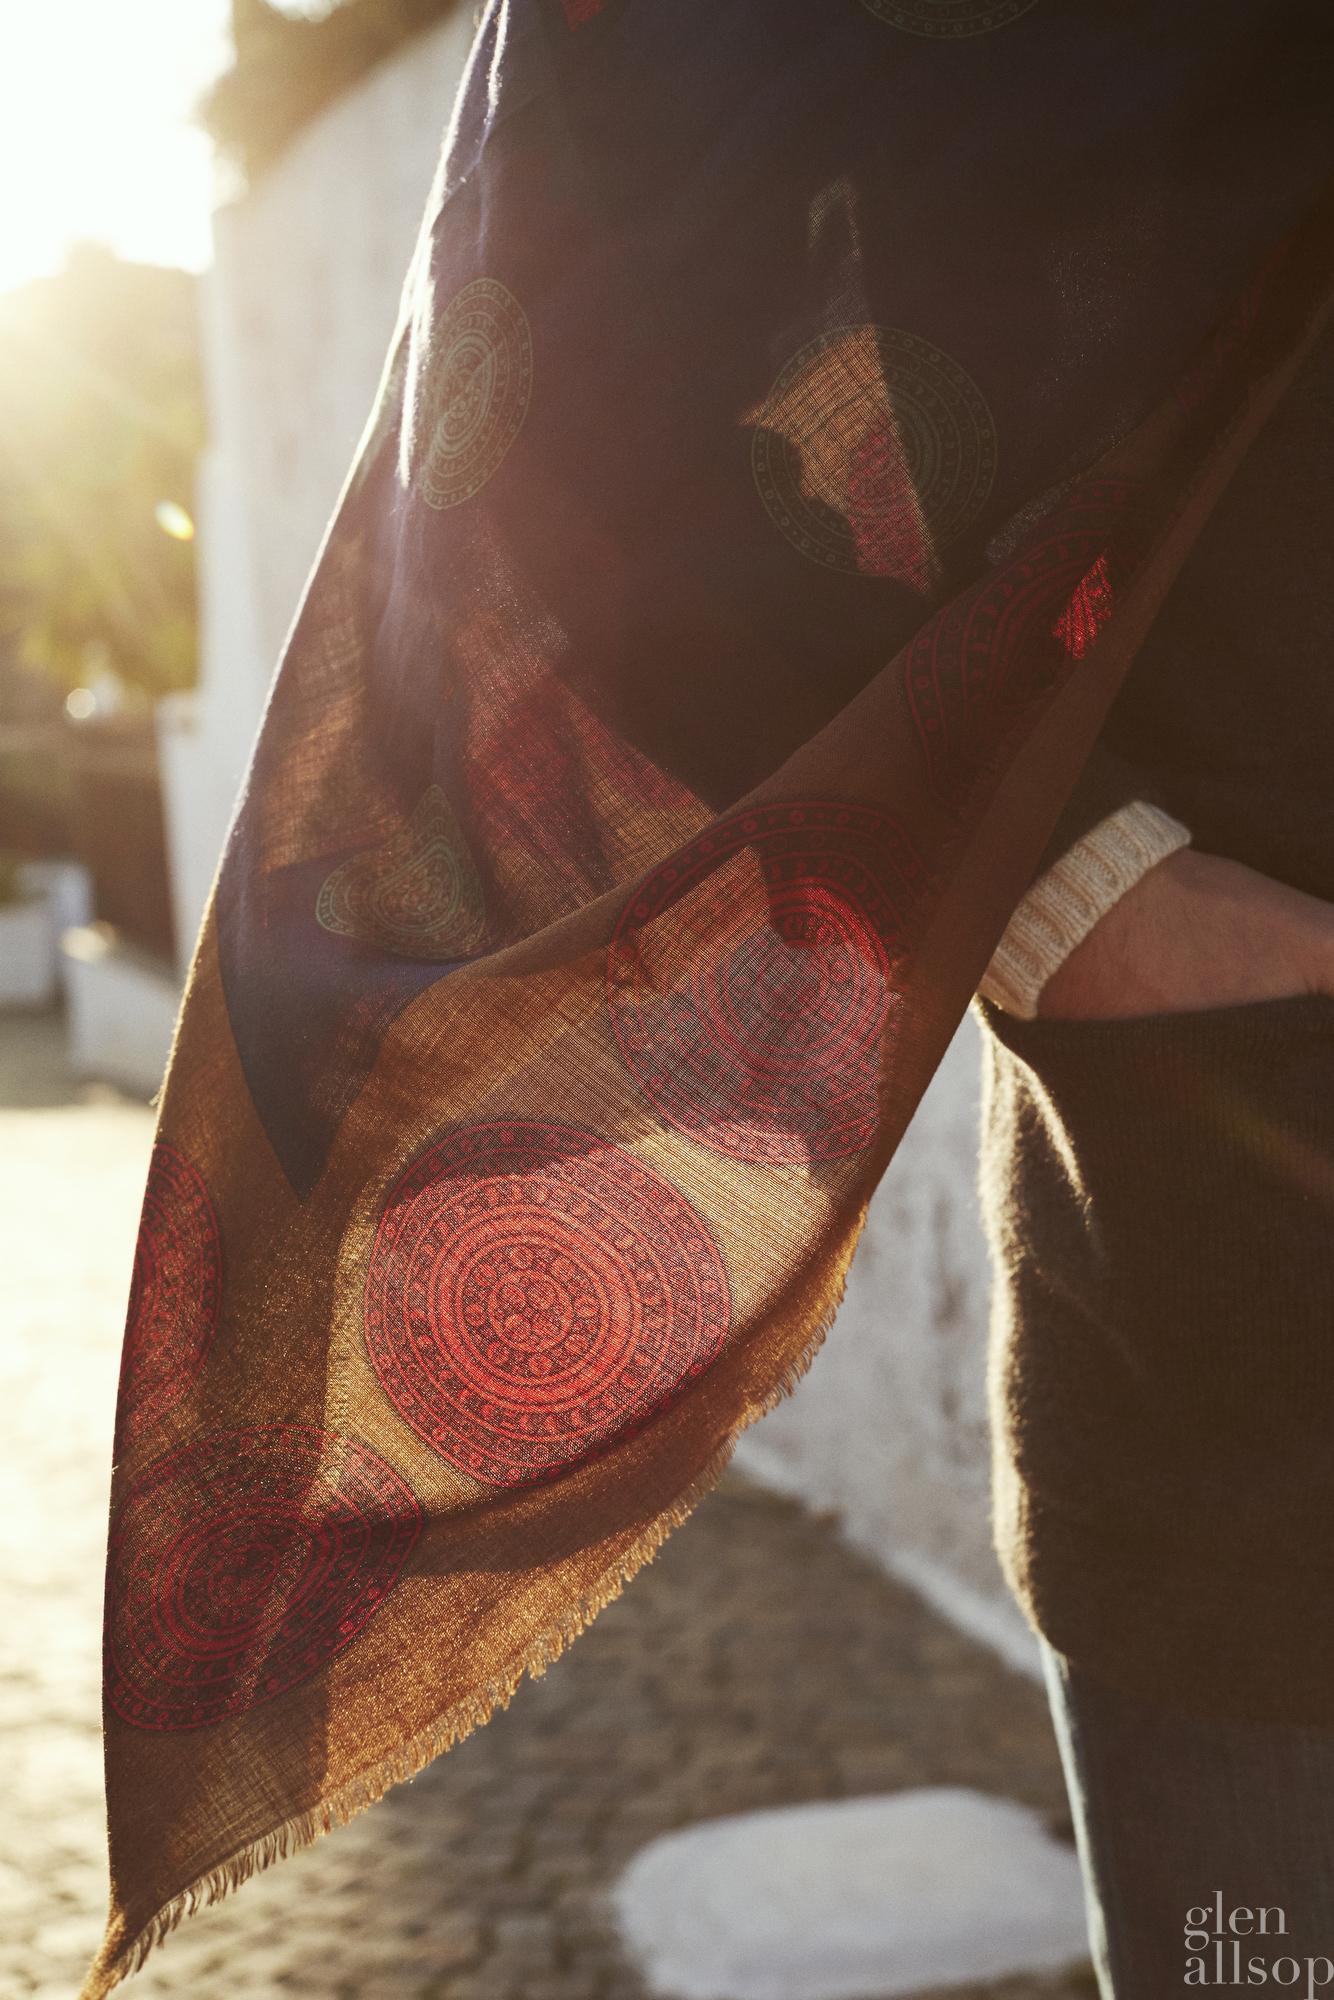 hermes-hermes scarf-amalfi coast-marcus malmborg